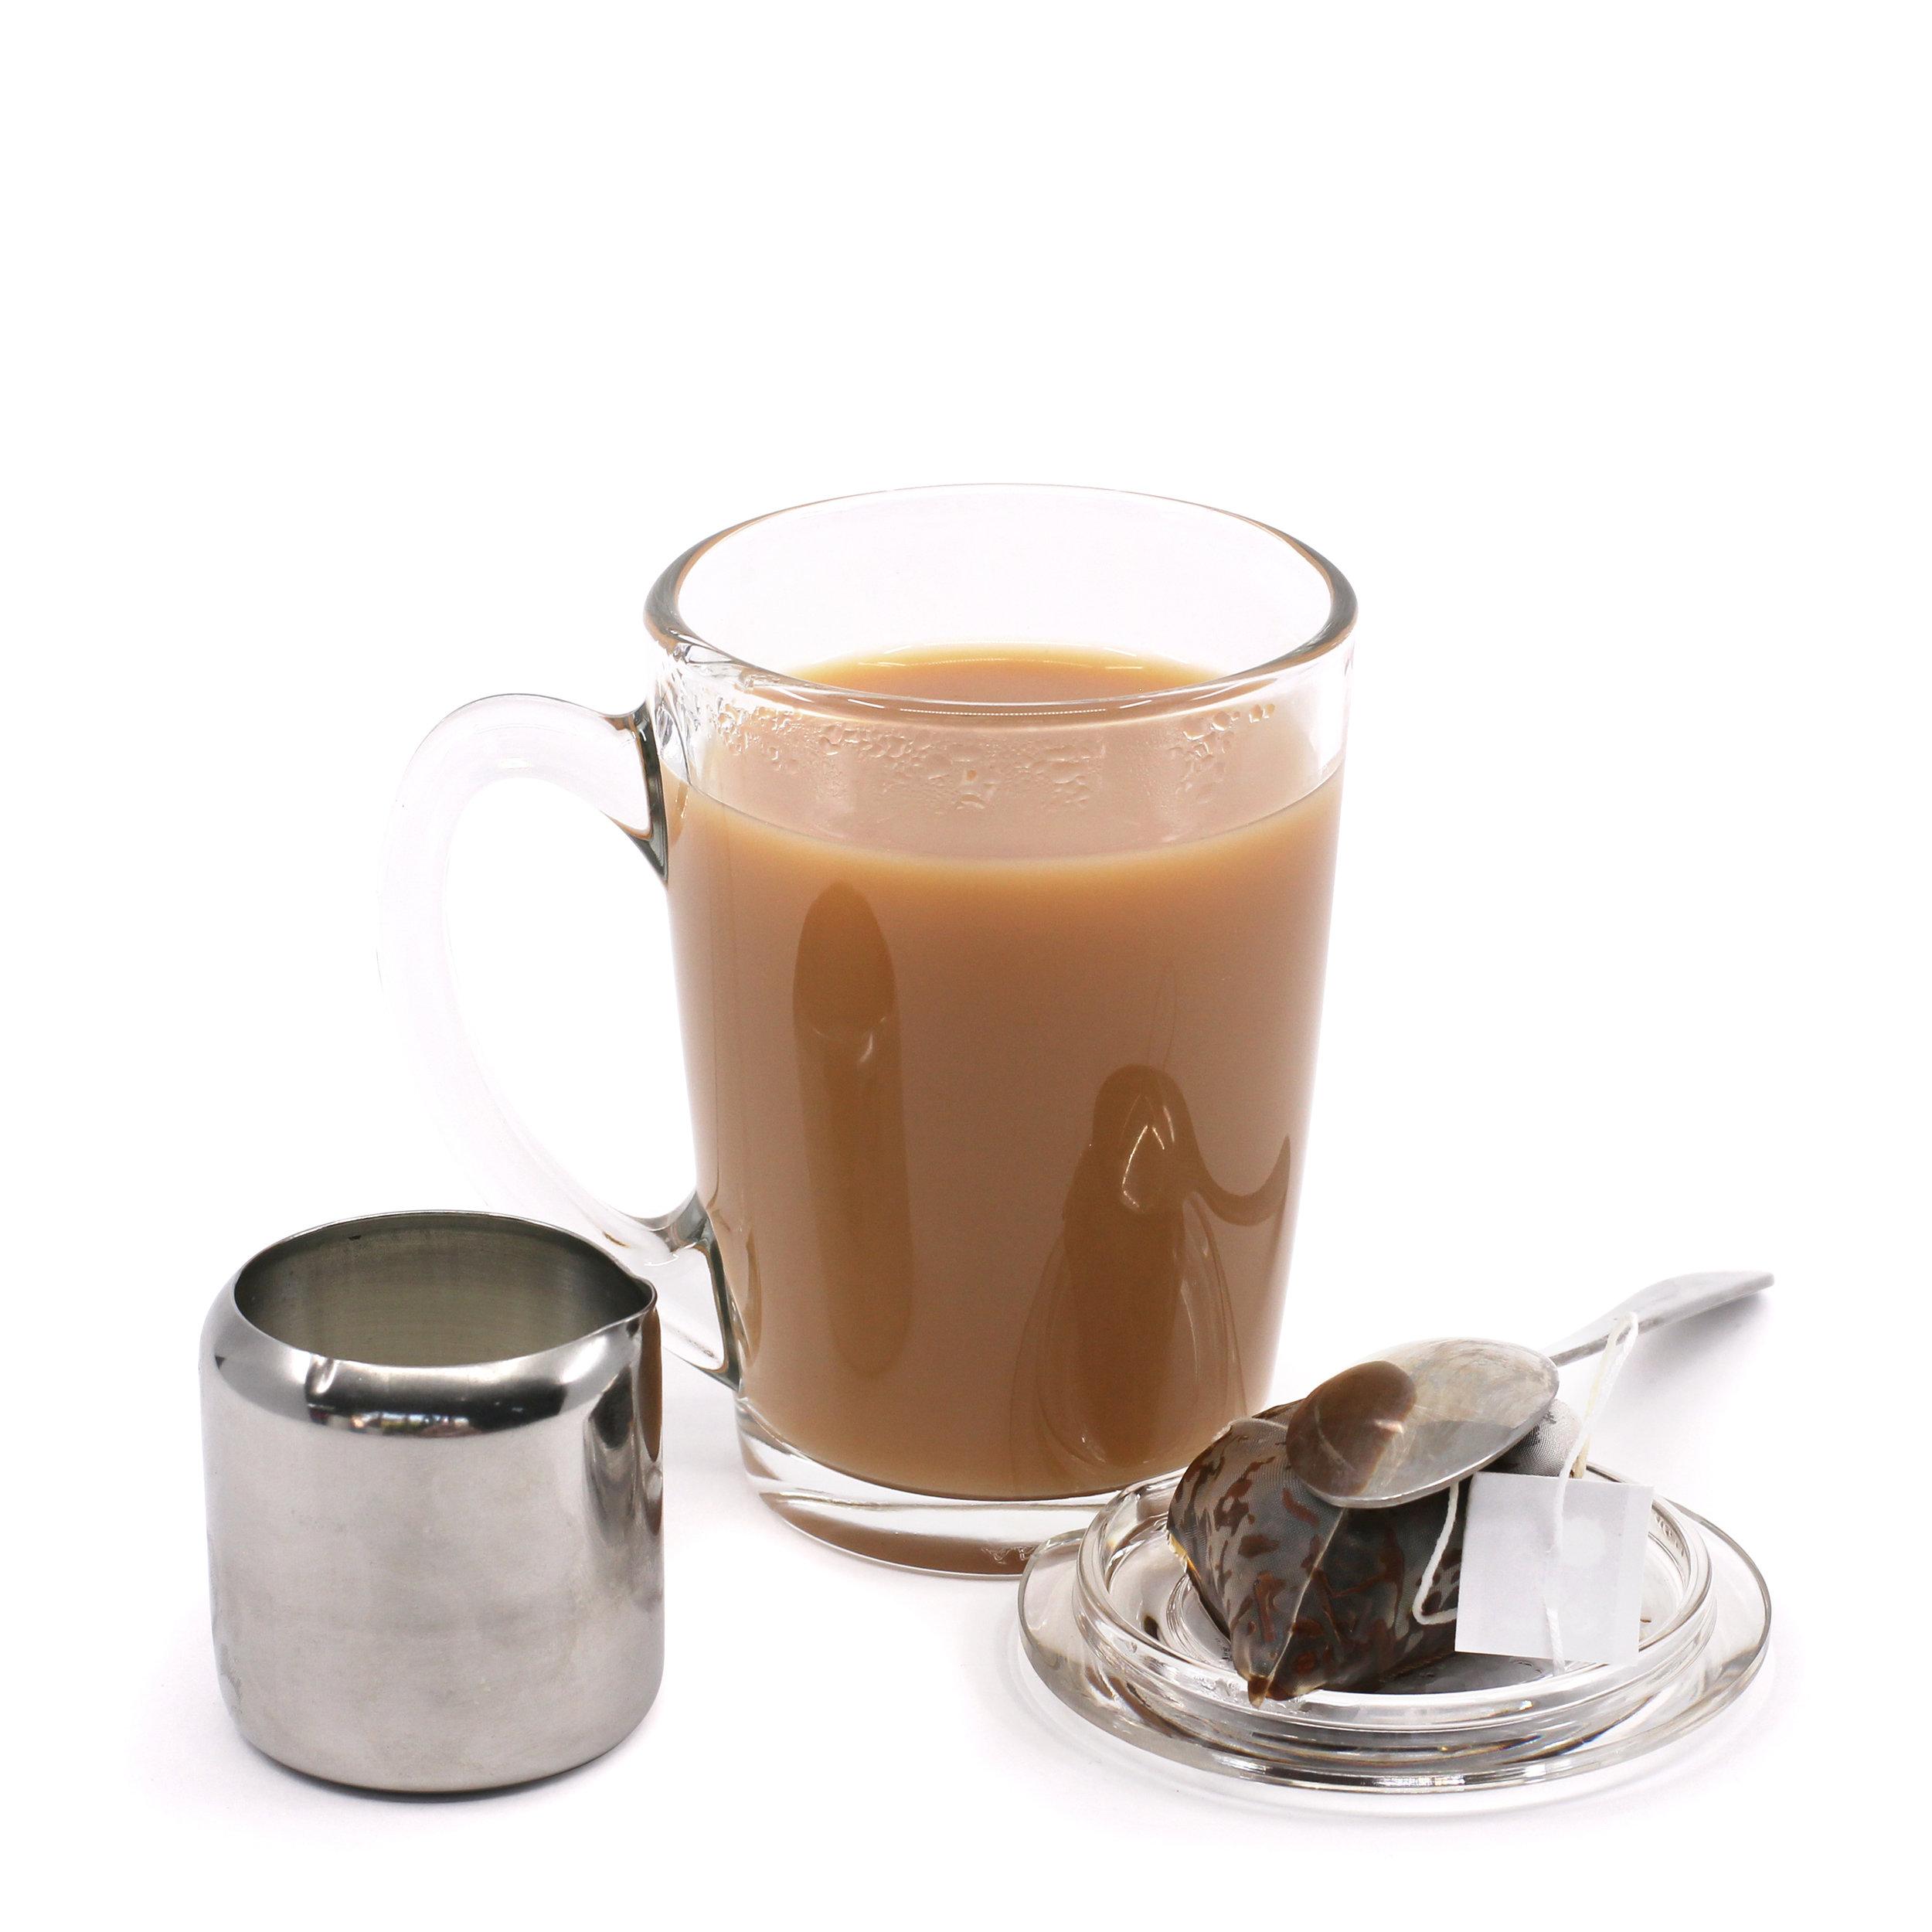 TEAPY® T-4-1™ | Tagged Tea Bag | Stainless Steel Jug | Spoon